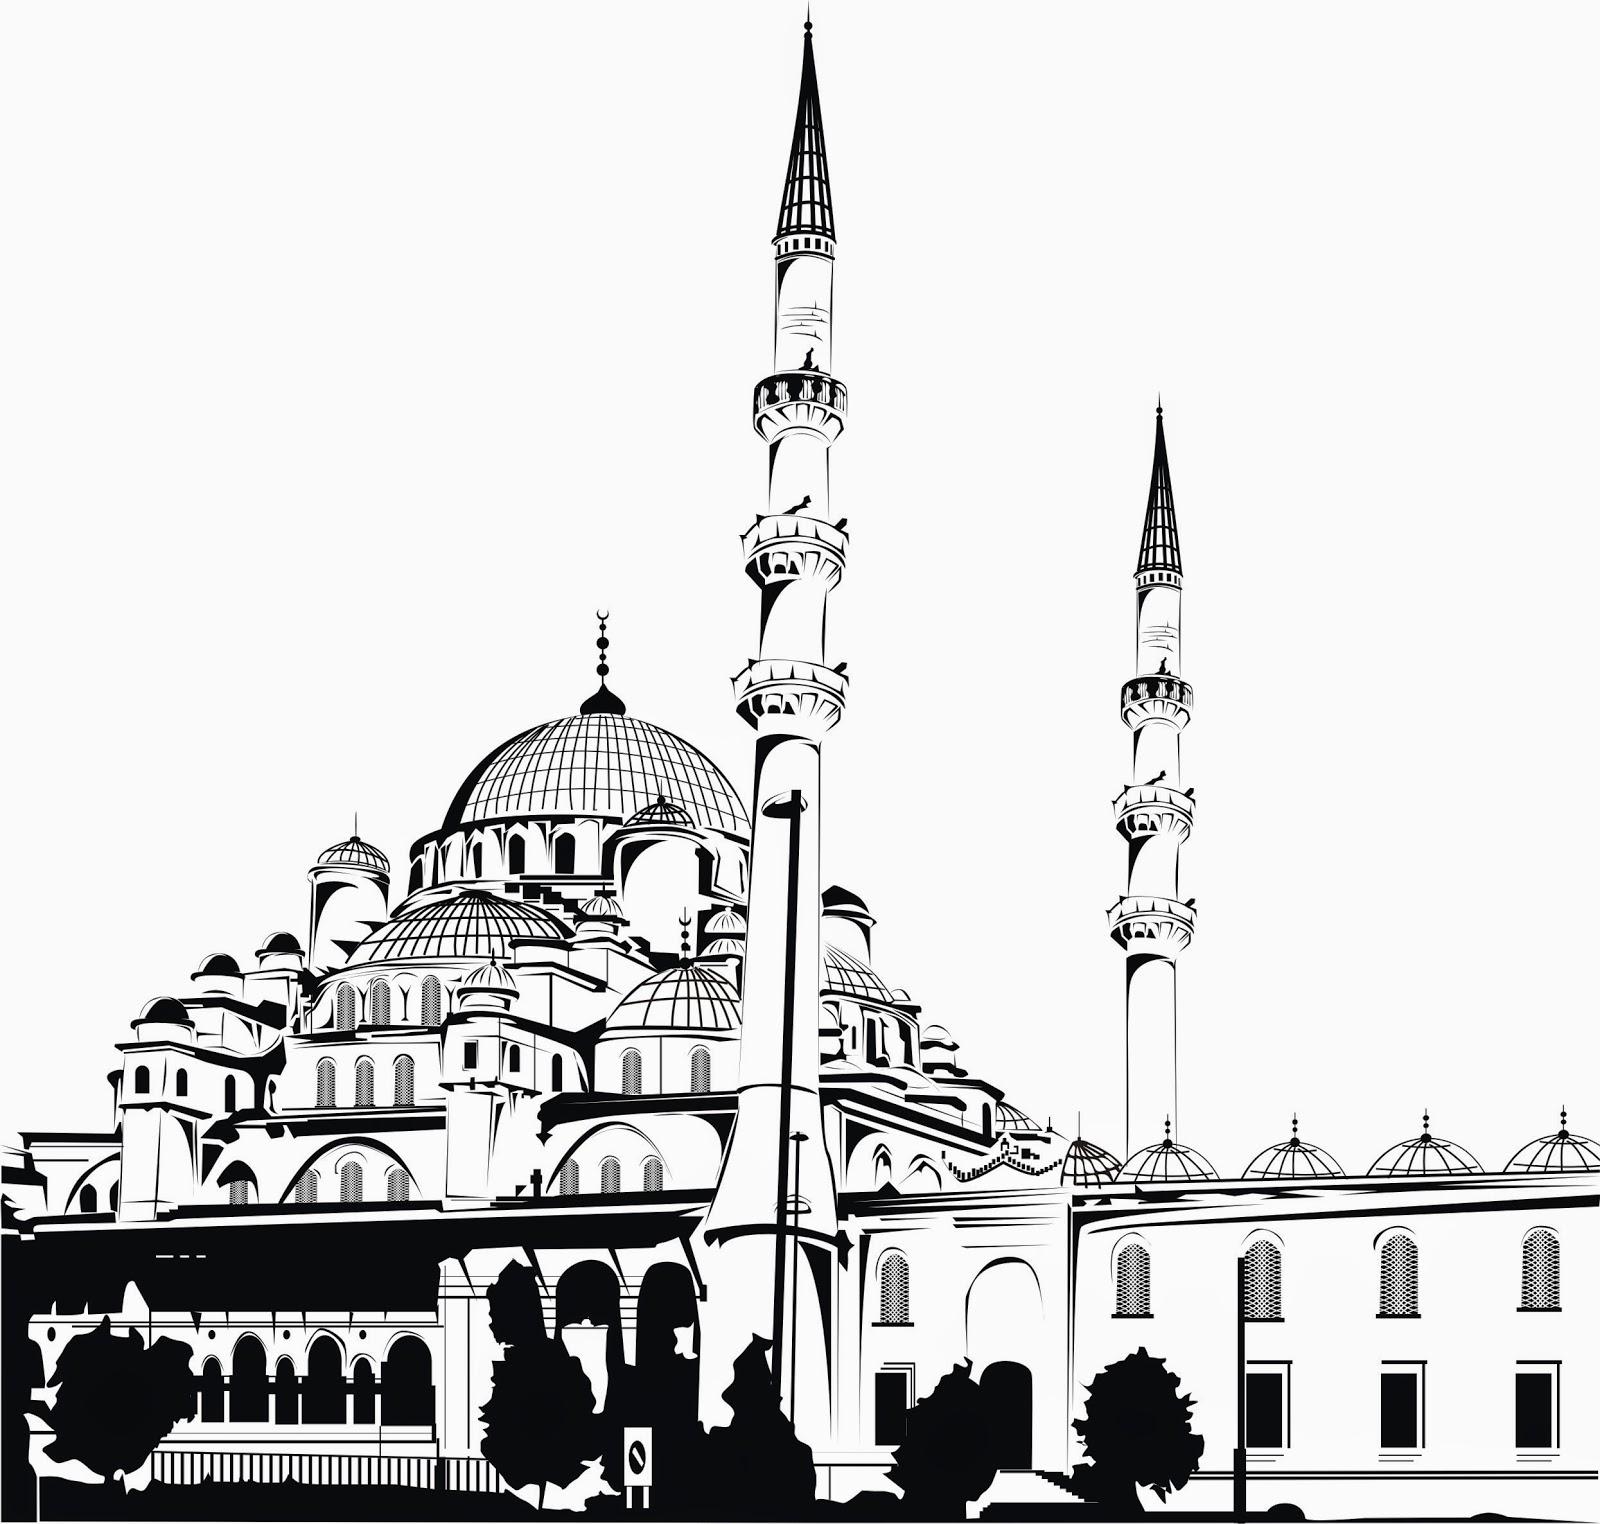 100 Foto Gambar Masjid Hitam Putih Hd Paling Keren